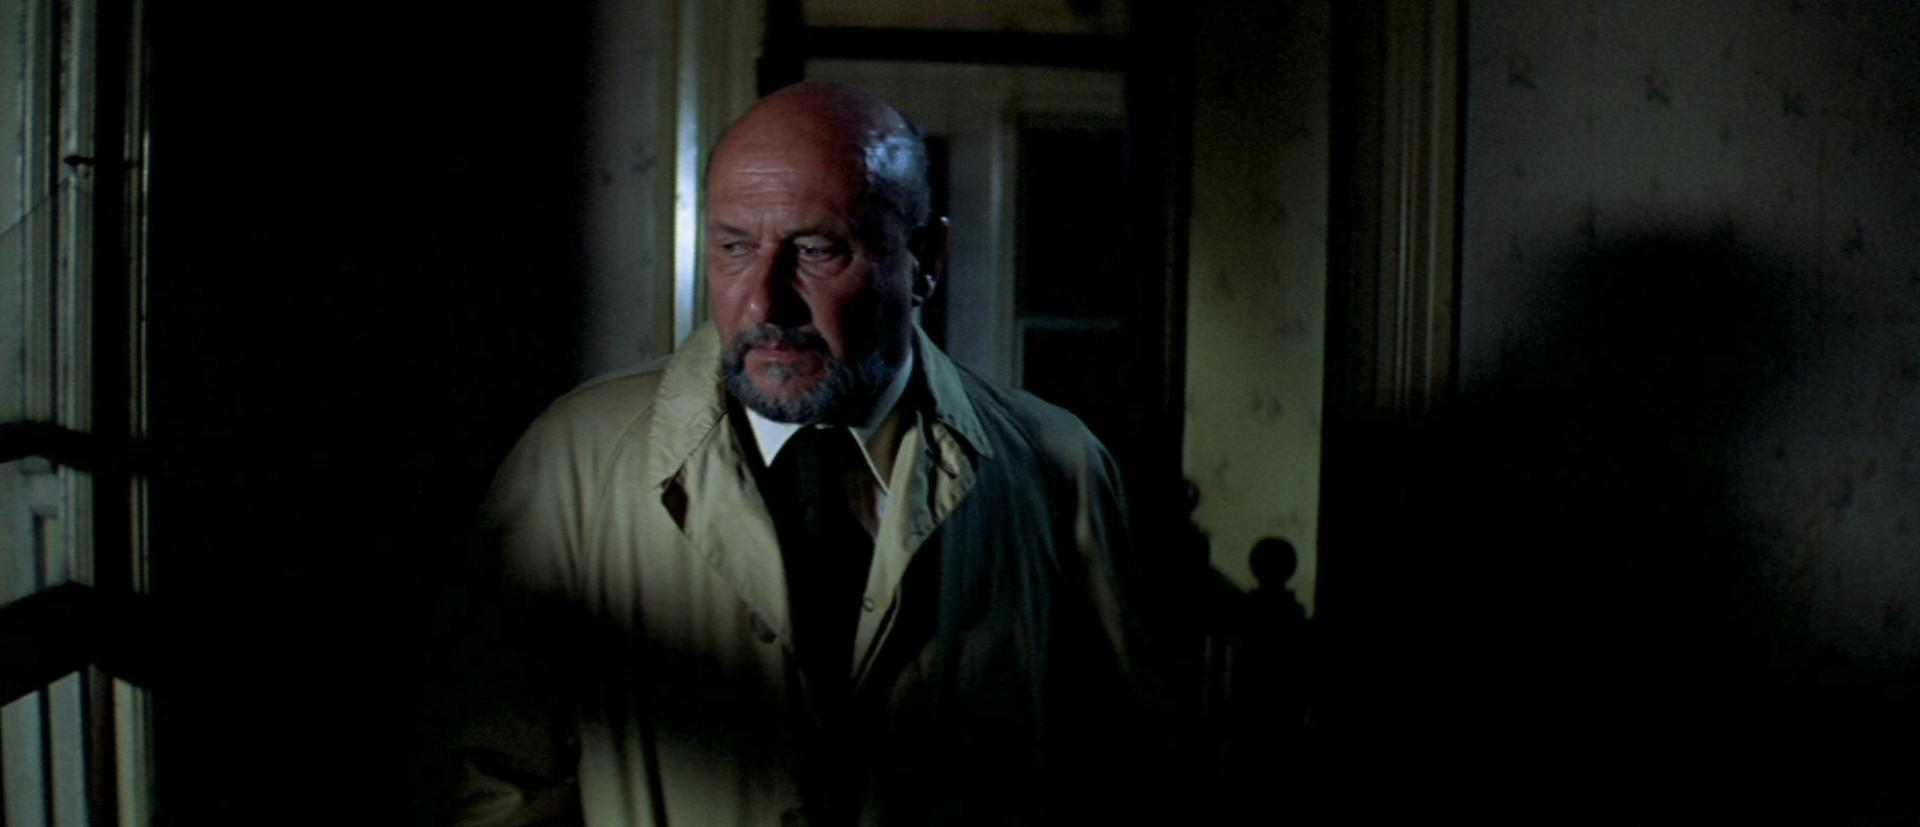 Halloween 2018 - Loomis jelenléte